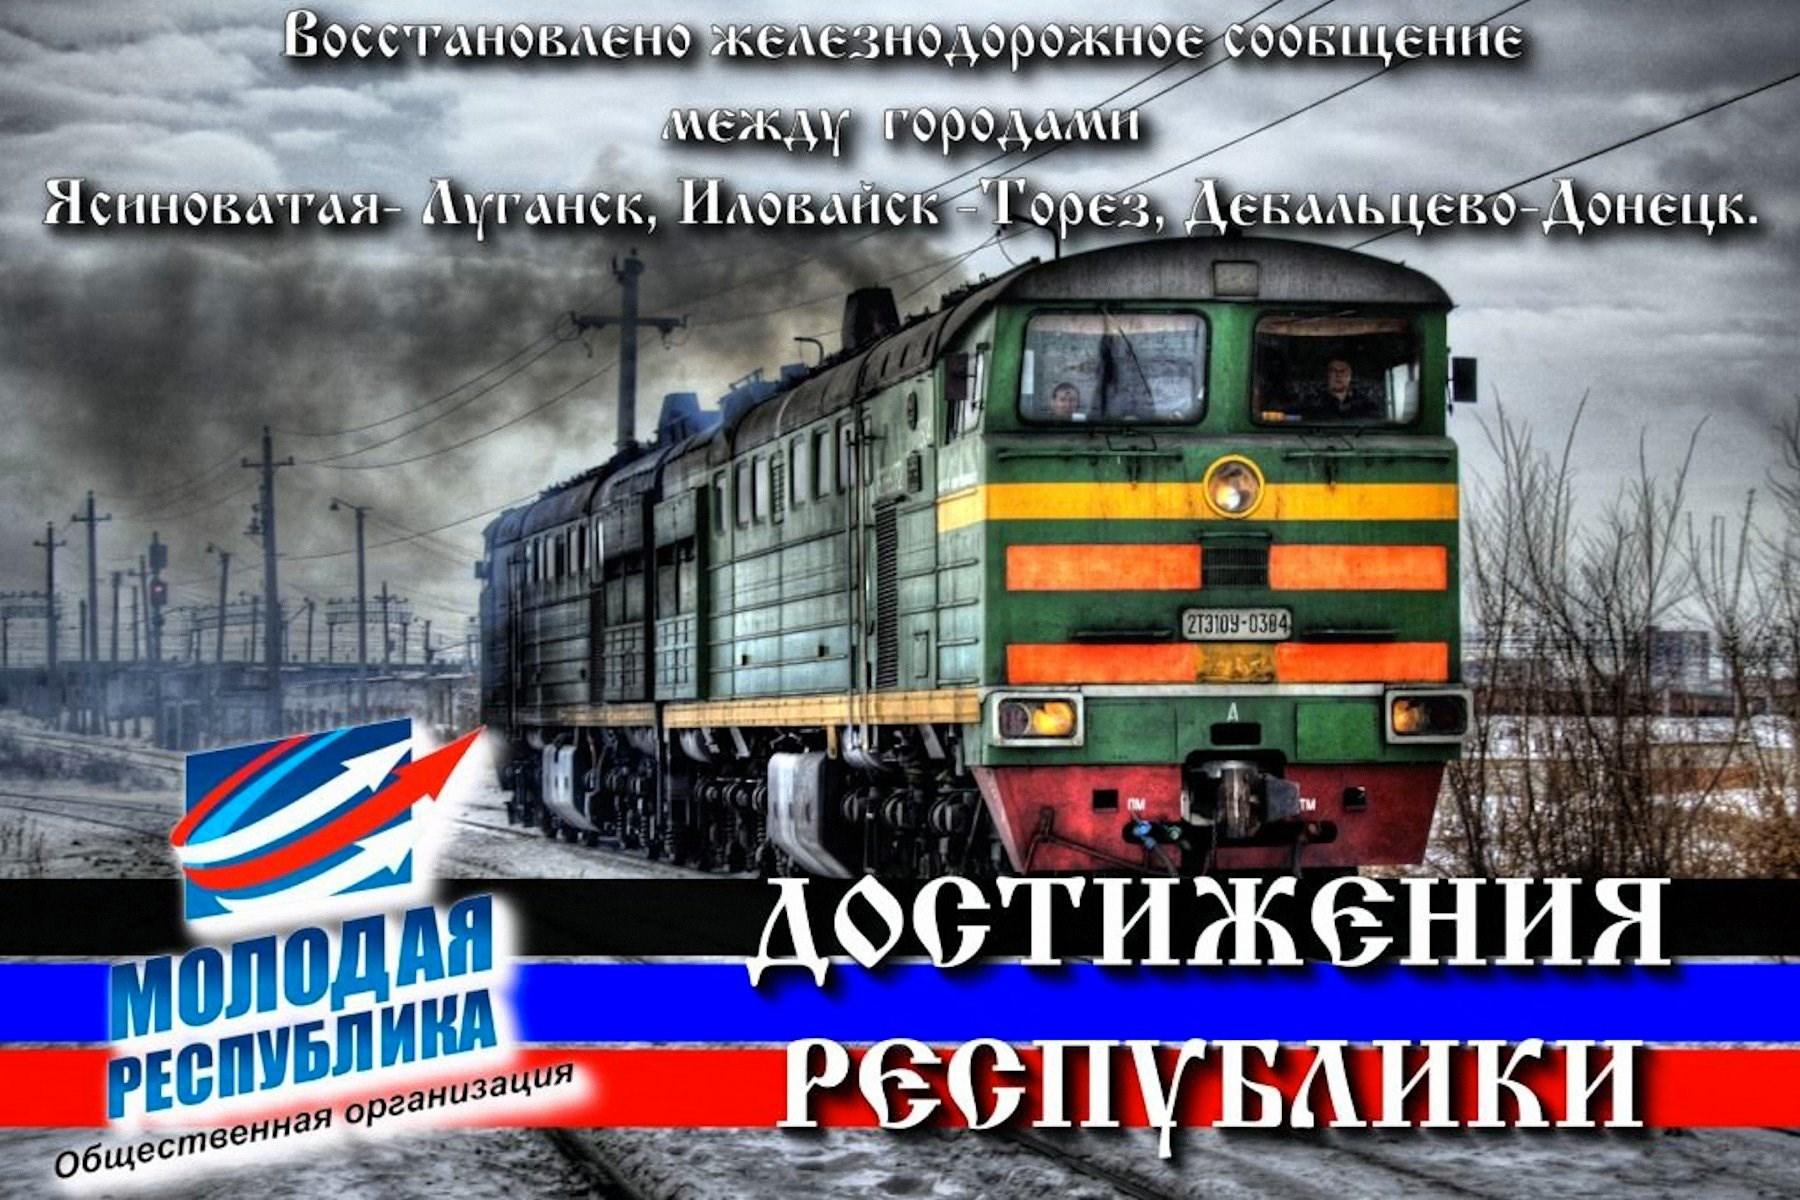 00 property of the republic dnr donetsk pr 07 280815